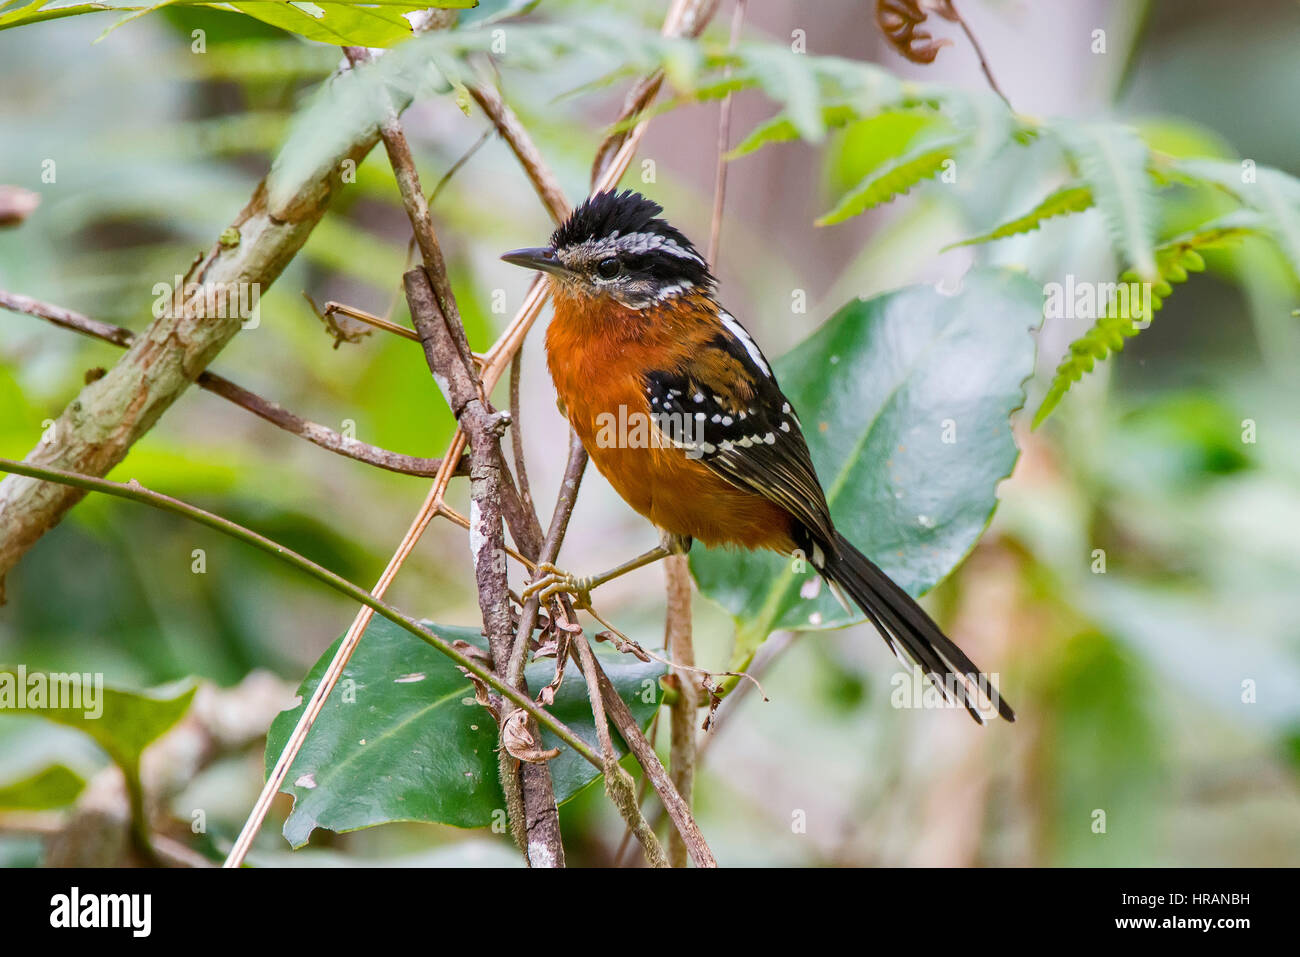 Ferruginosa antbird (Drymophila ferruginea), fotografiado en Afonso Cláudio, Espírito Santo, sudeste de Imagen De Stock